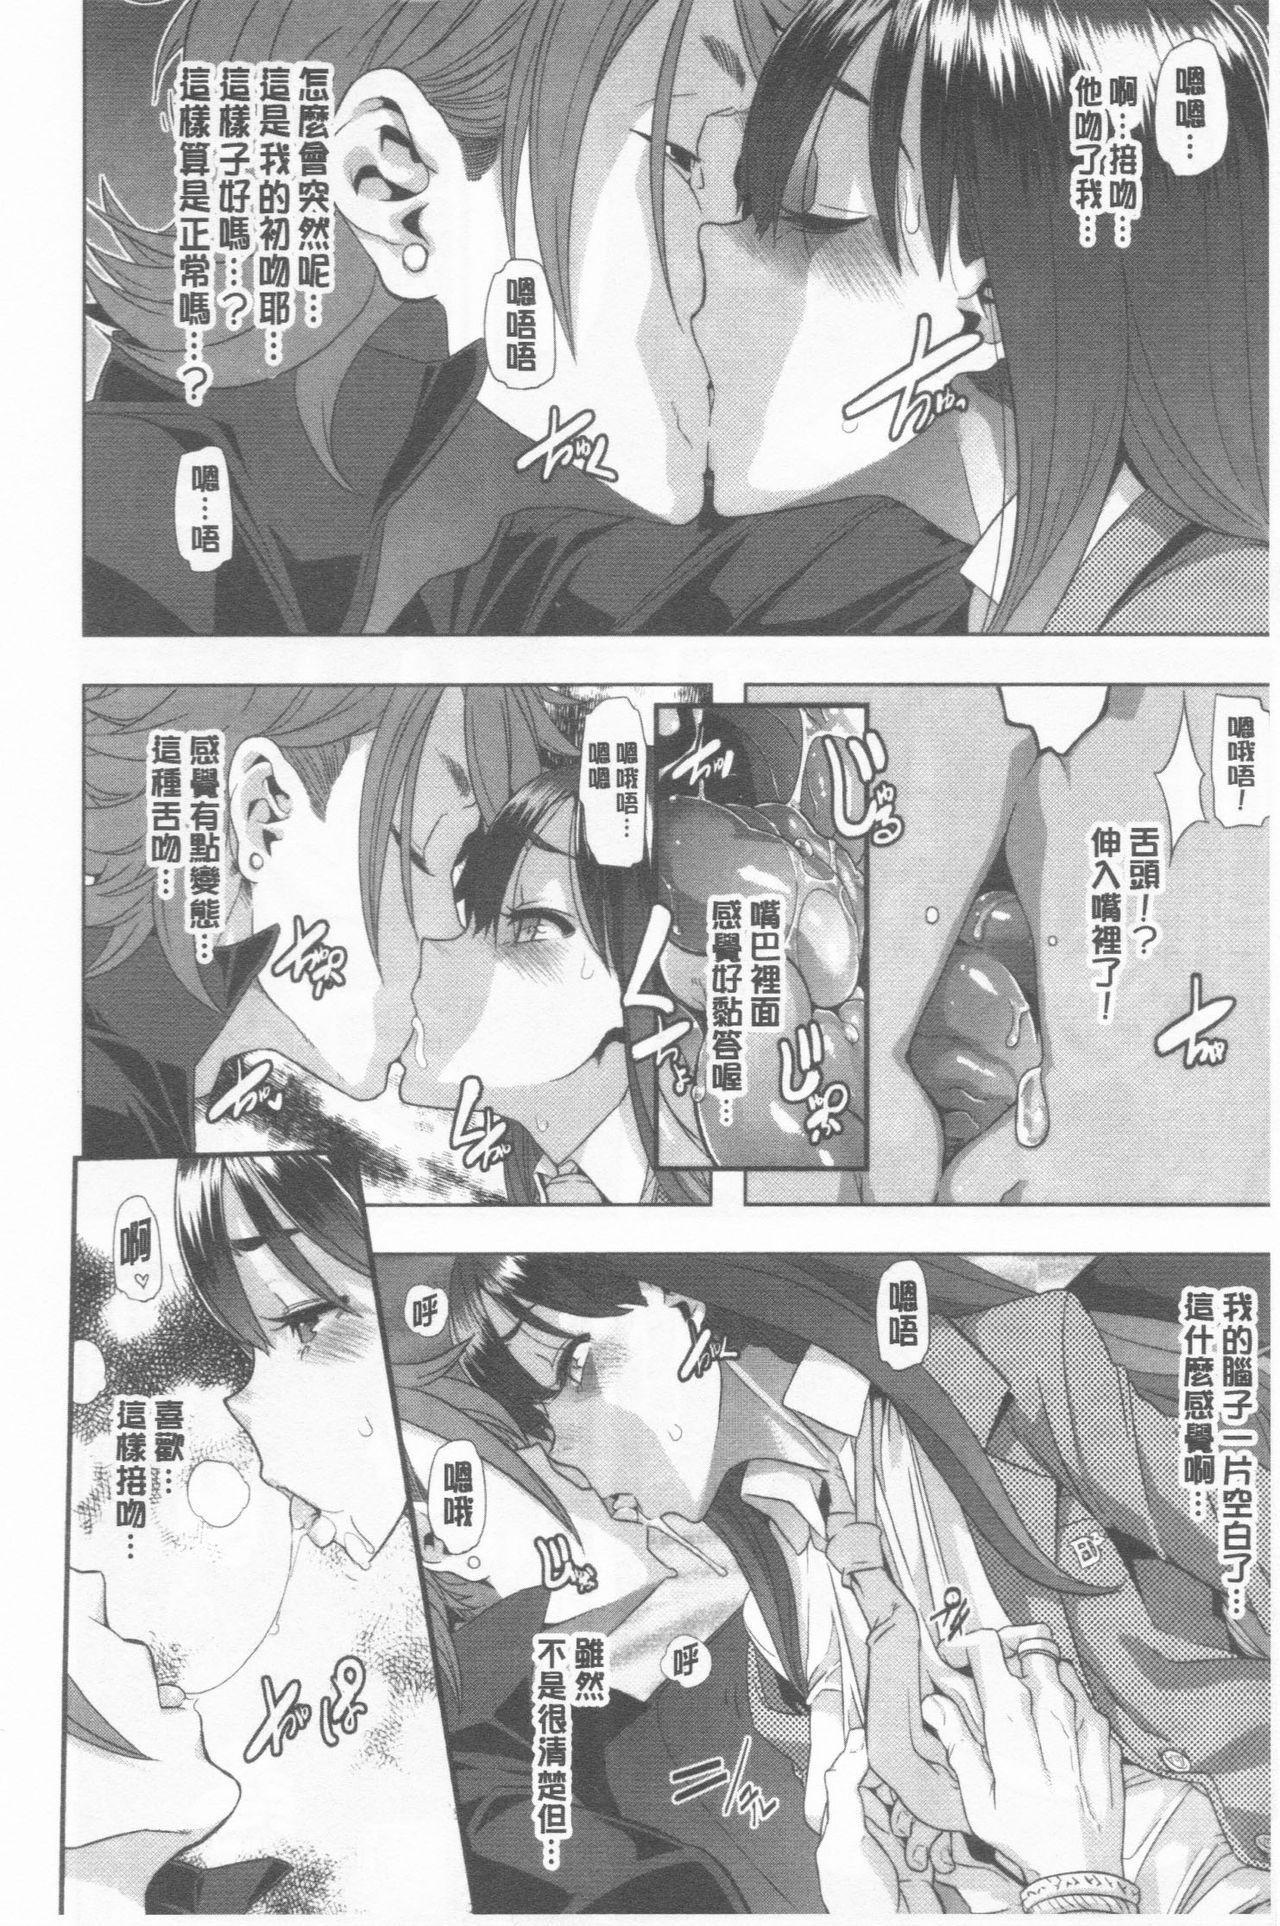 Henshin + 4P leaflet 14